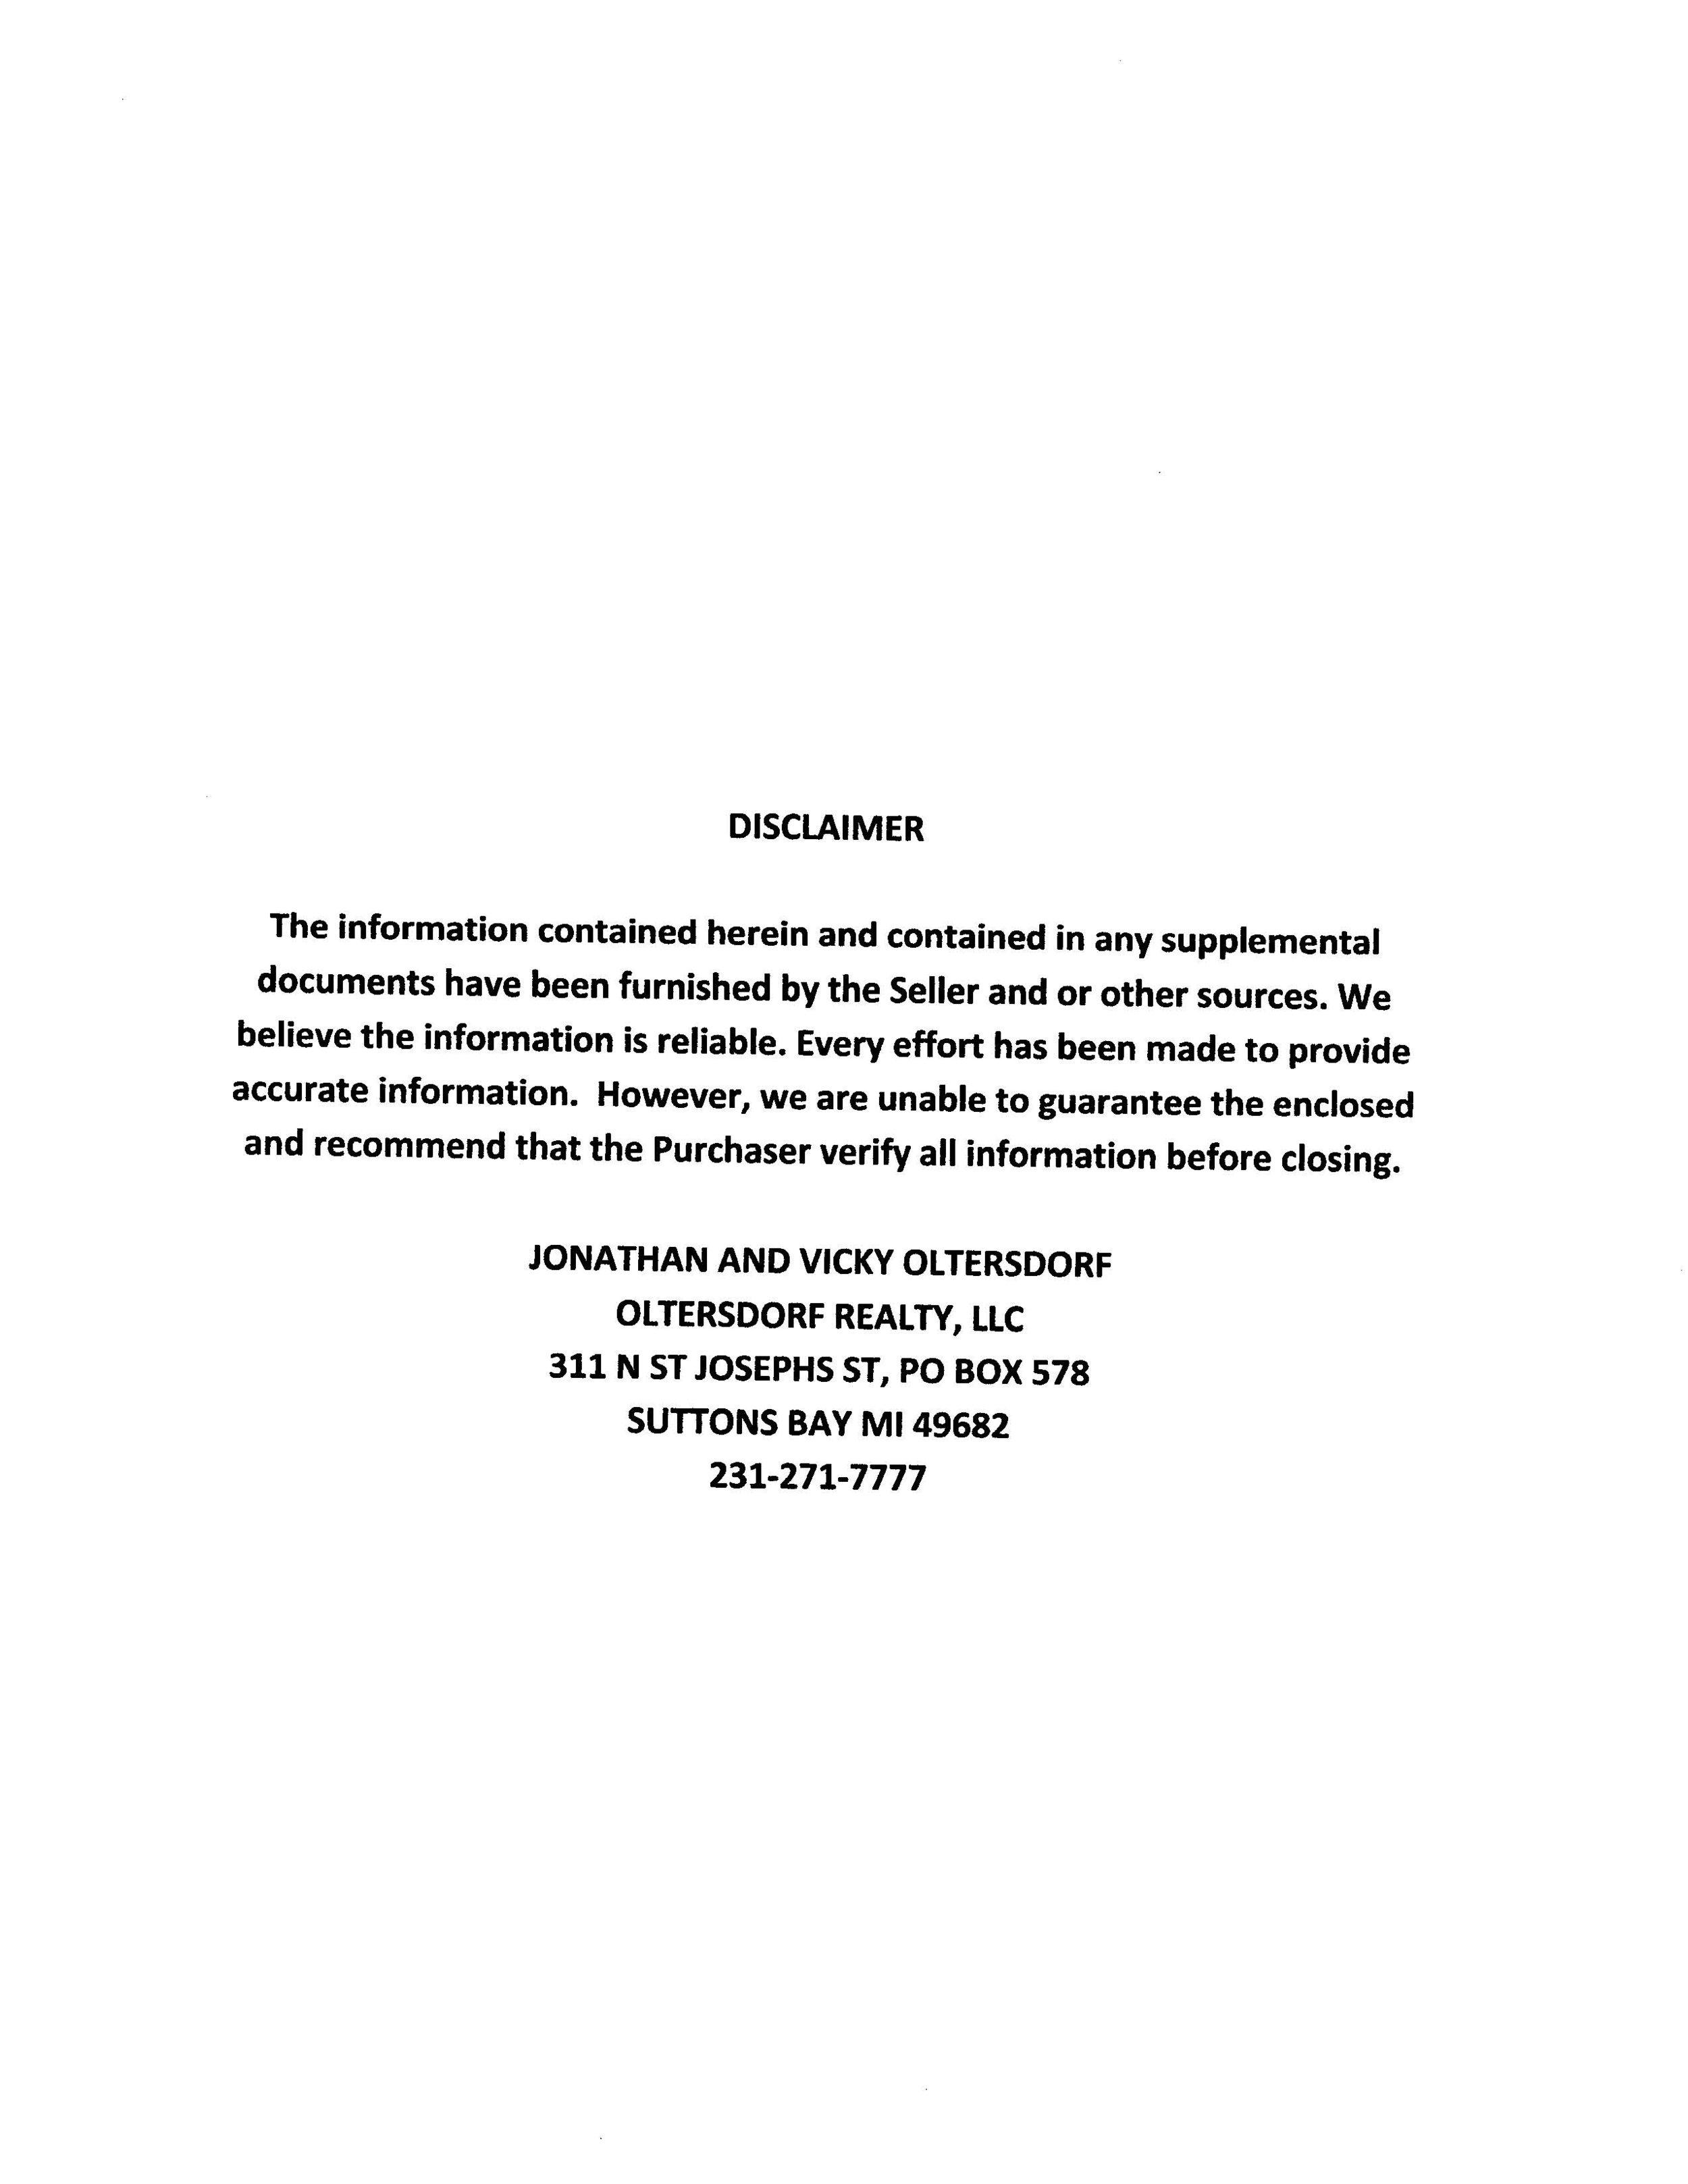 4936 Truax Lake Road, Williamsburg Marketing - For Sale by Oltersdorf Realty LLC (15).jpg